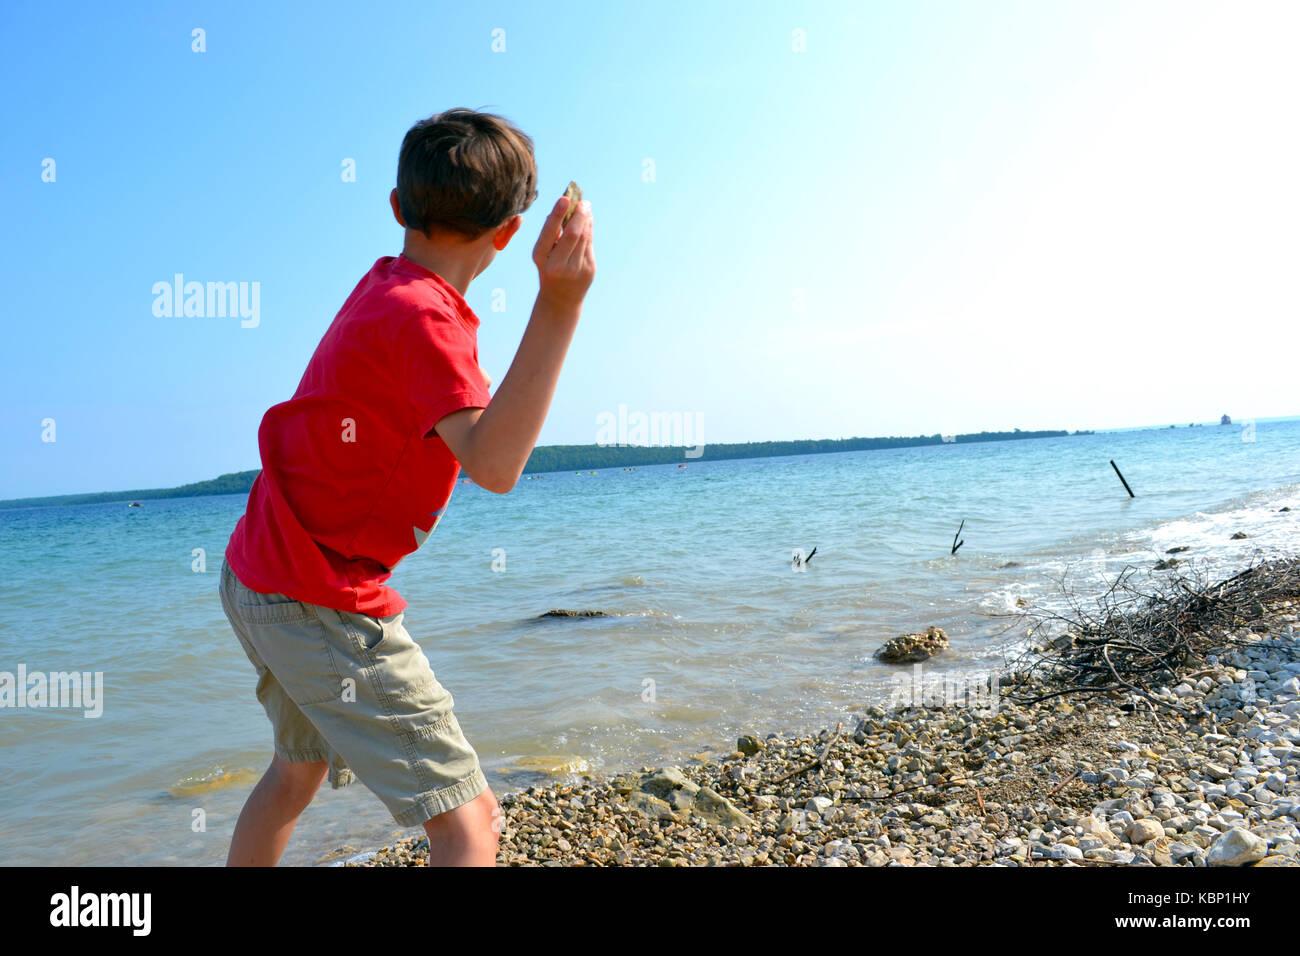 Boy skipping stones - Stock Image